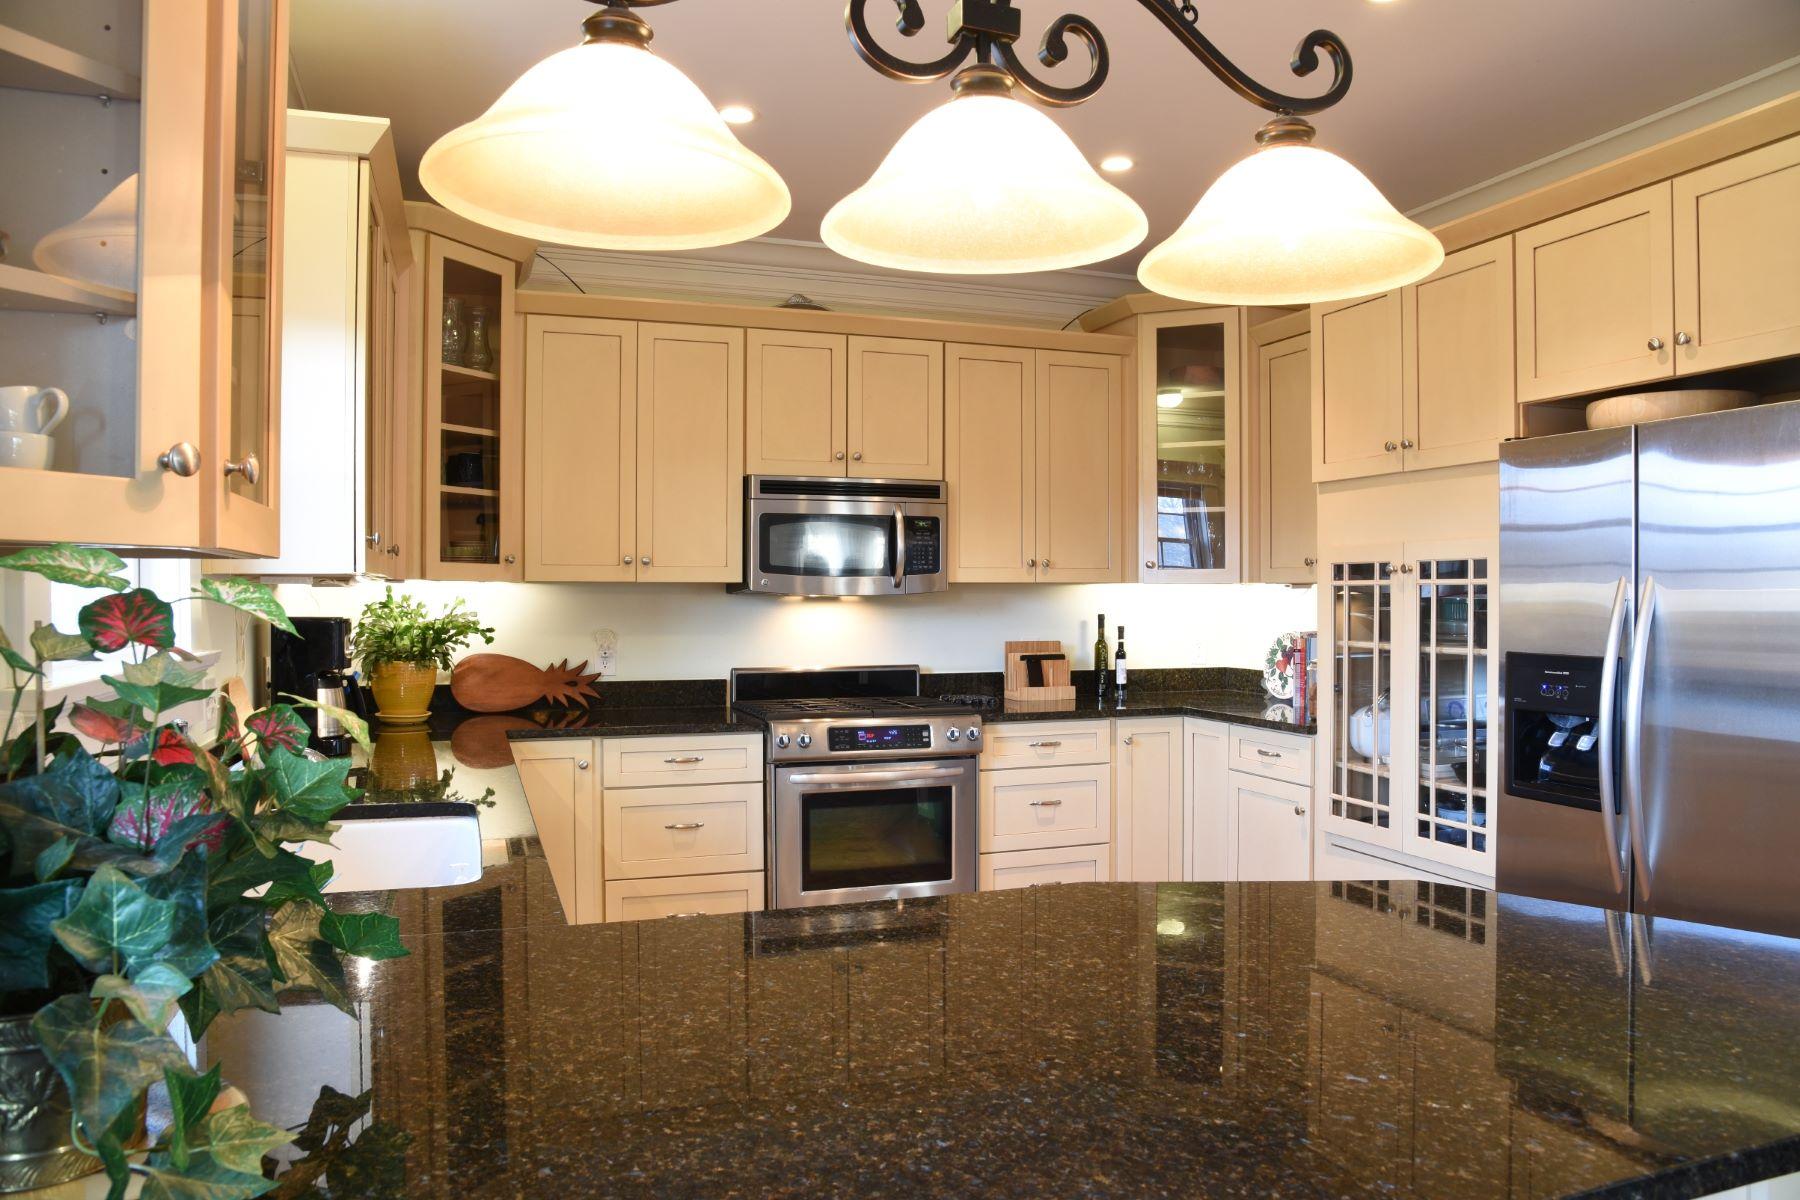 Additional photo for property listing at Vanderbilt Stable Condominiums 53 Sandy Point Farm Road 5 Portsmouth, Rhode Island 02871 Estados Unidos